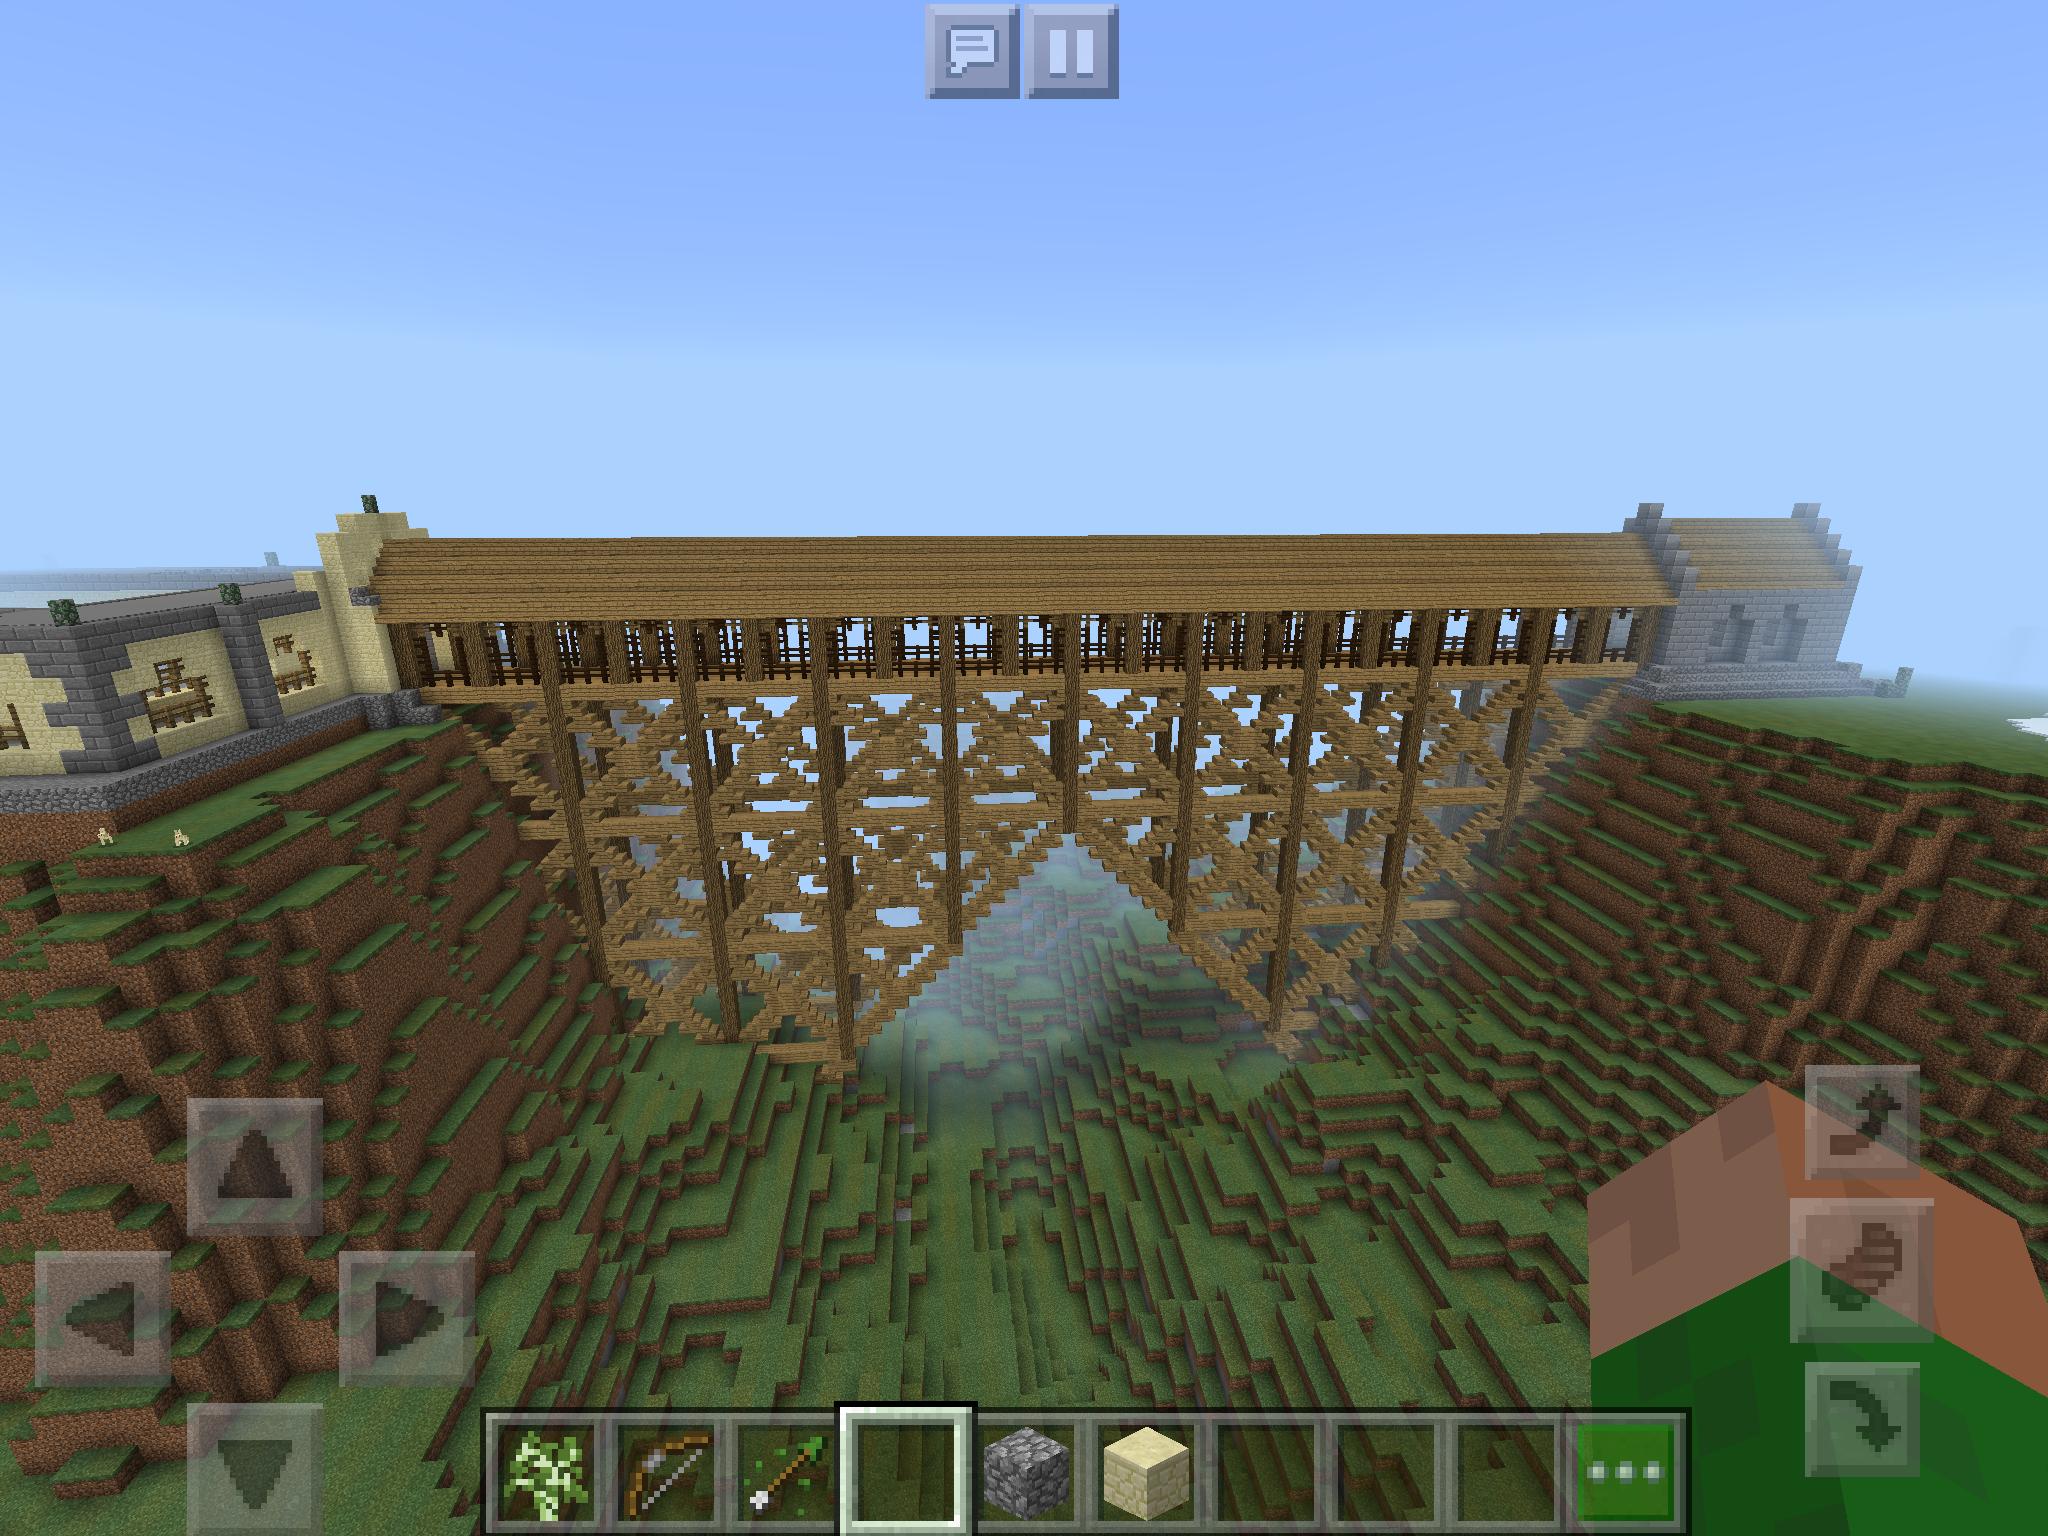 Harry Potter Bridge Harry Potter Minecraft Hogwarts Minecraft Minecraft Houses